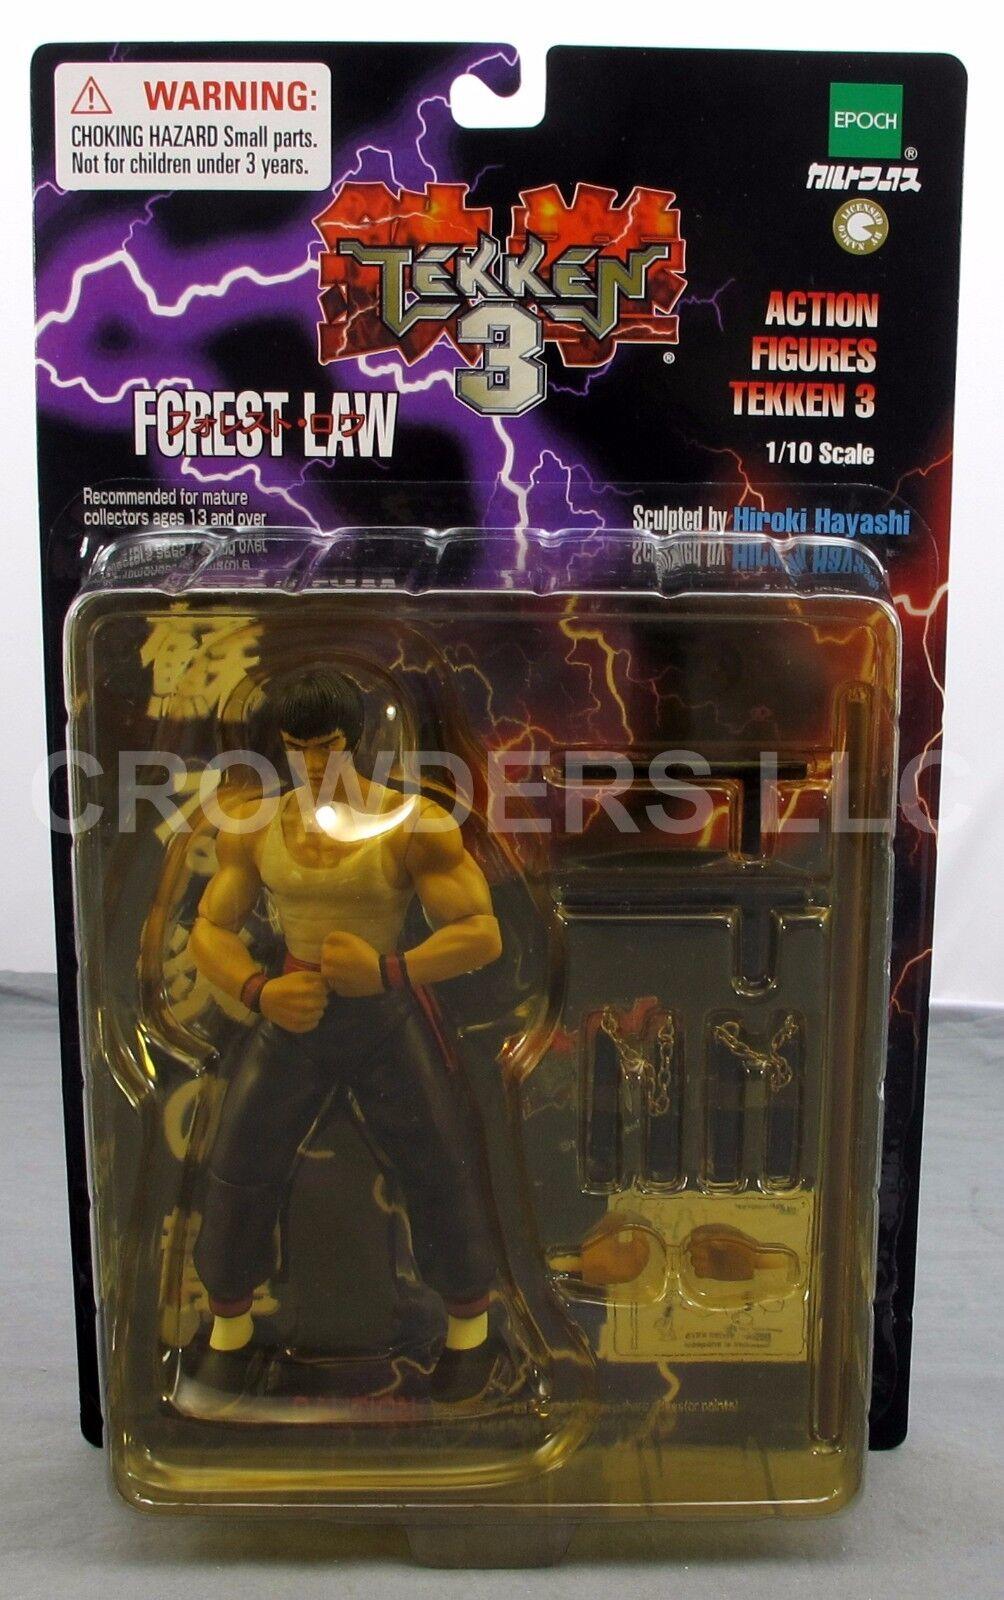 Forest Law Tekken 3 Action Figures Figures Figures 6.5  1 10 Scale Epoch Hiroki Hayashi NIP '00 434bad